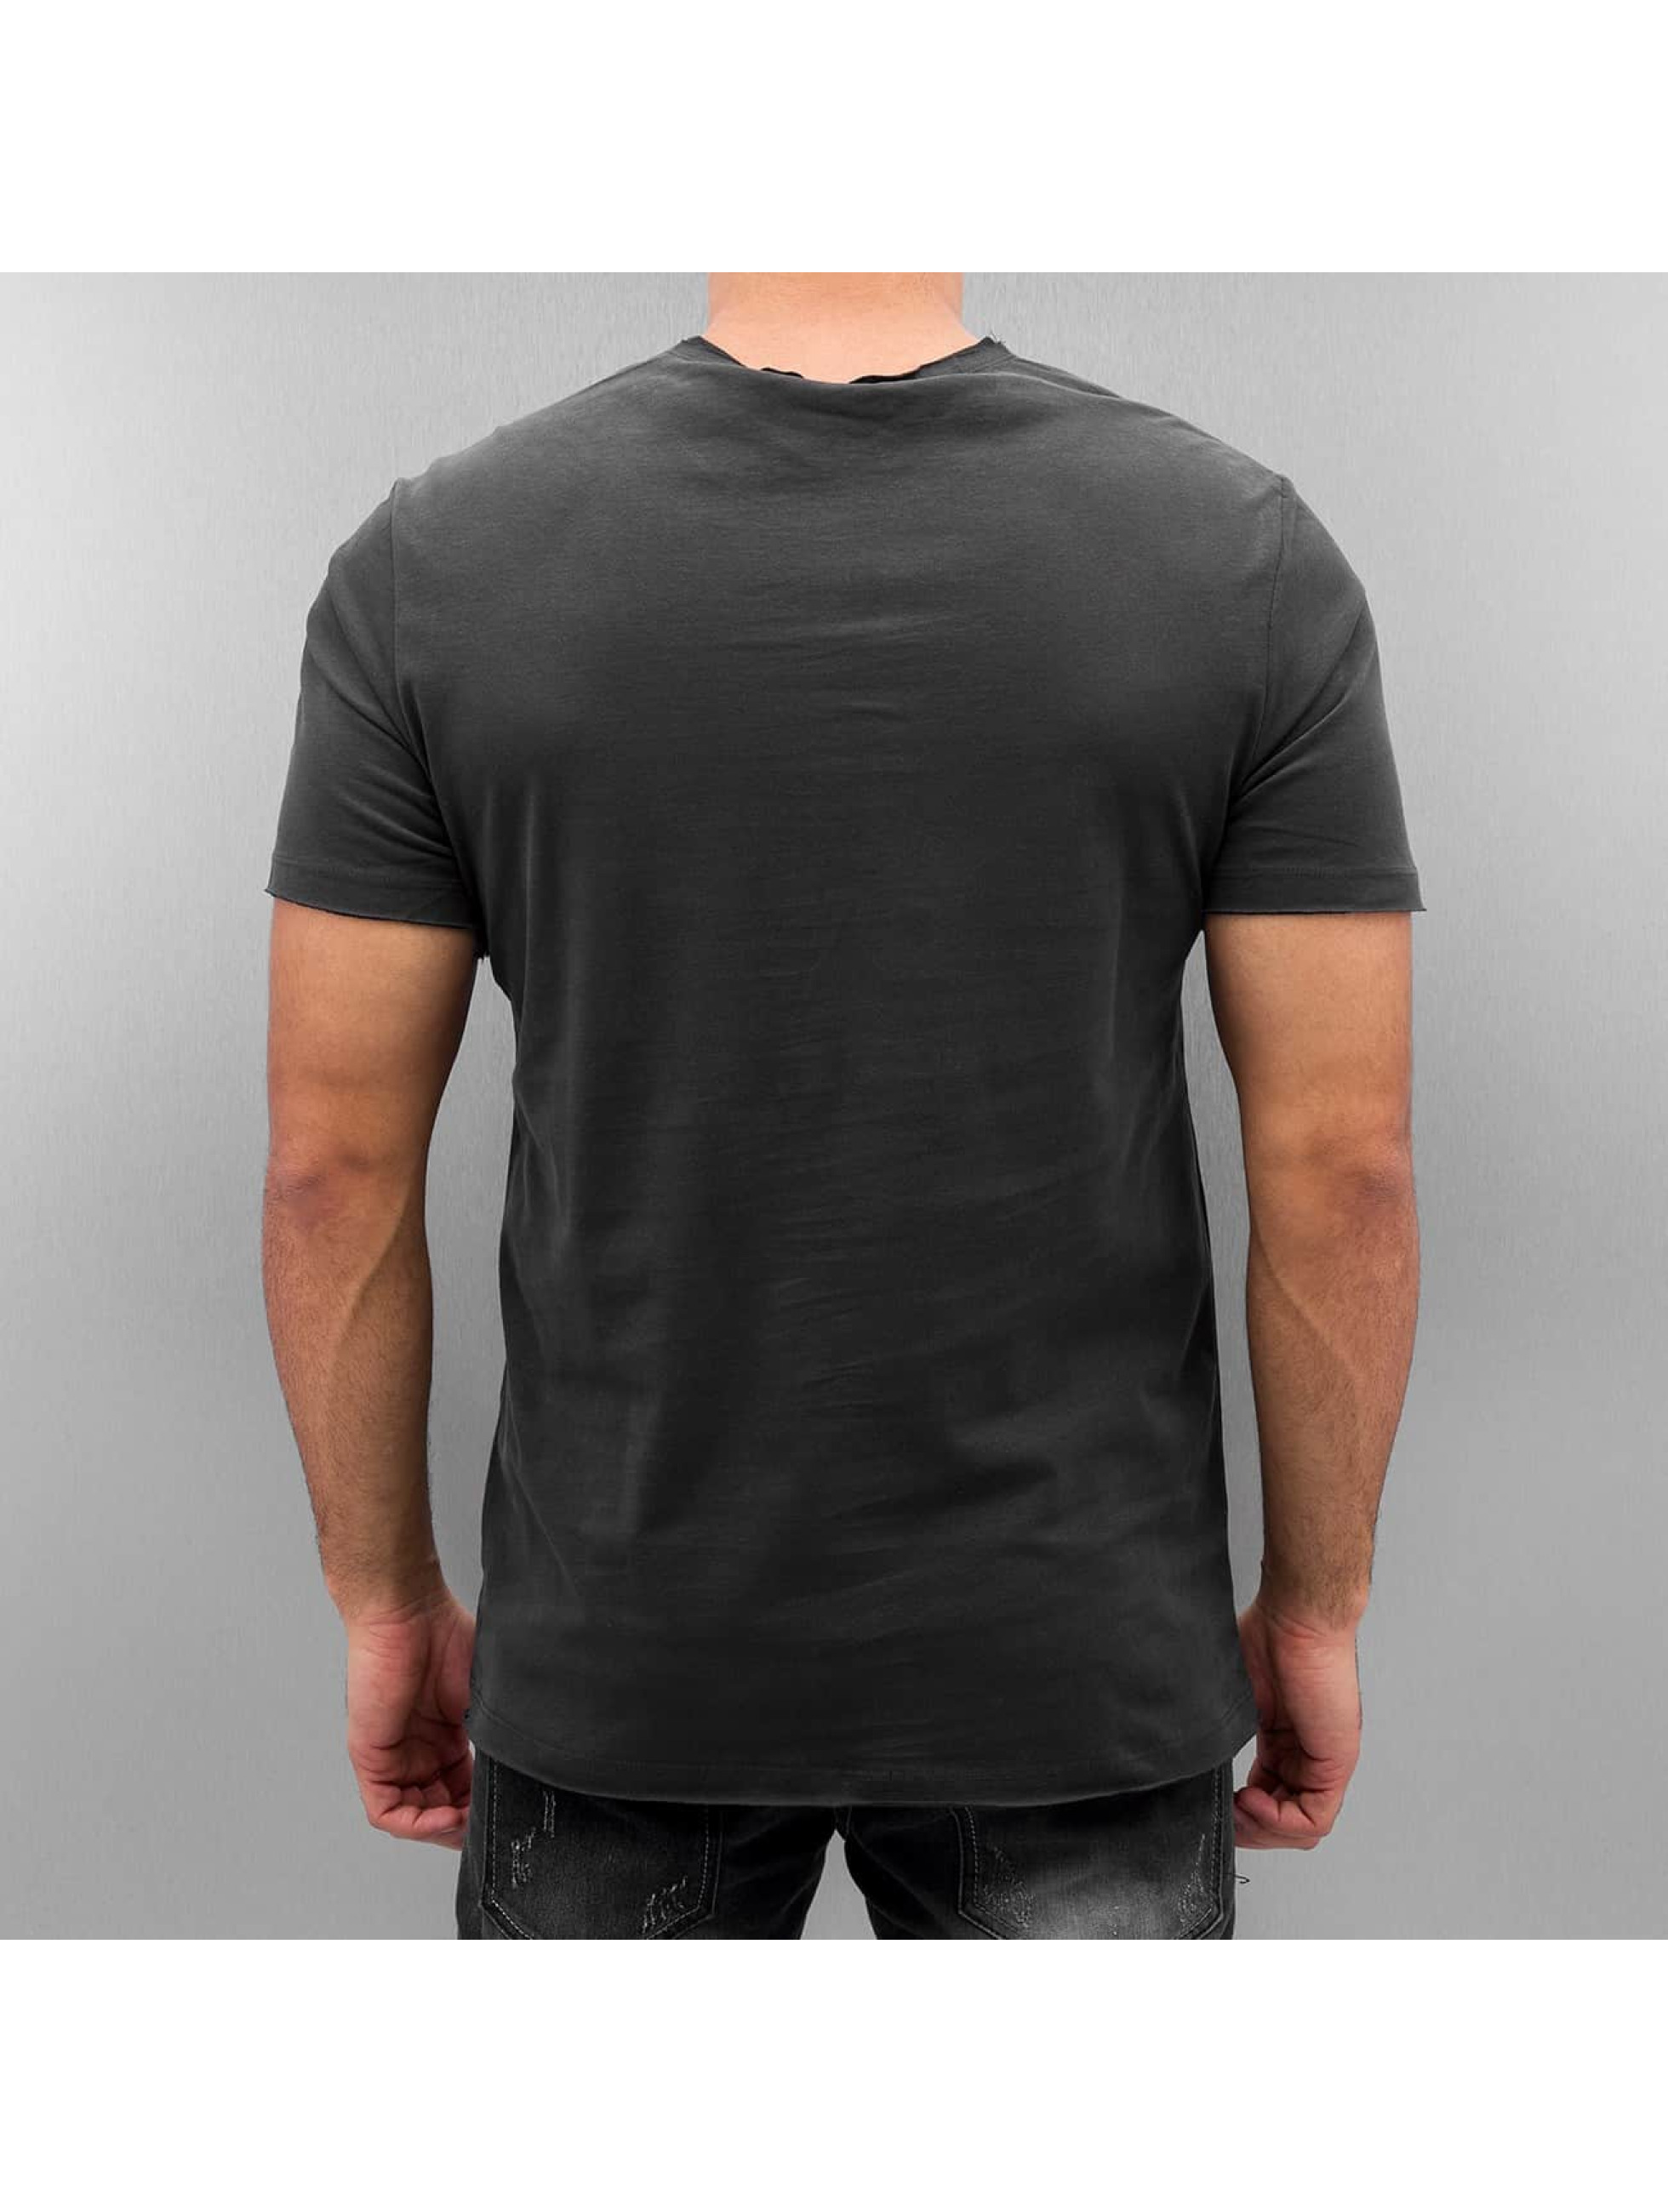 Amplified T-Shirt RUN DMC Logo gris